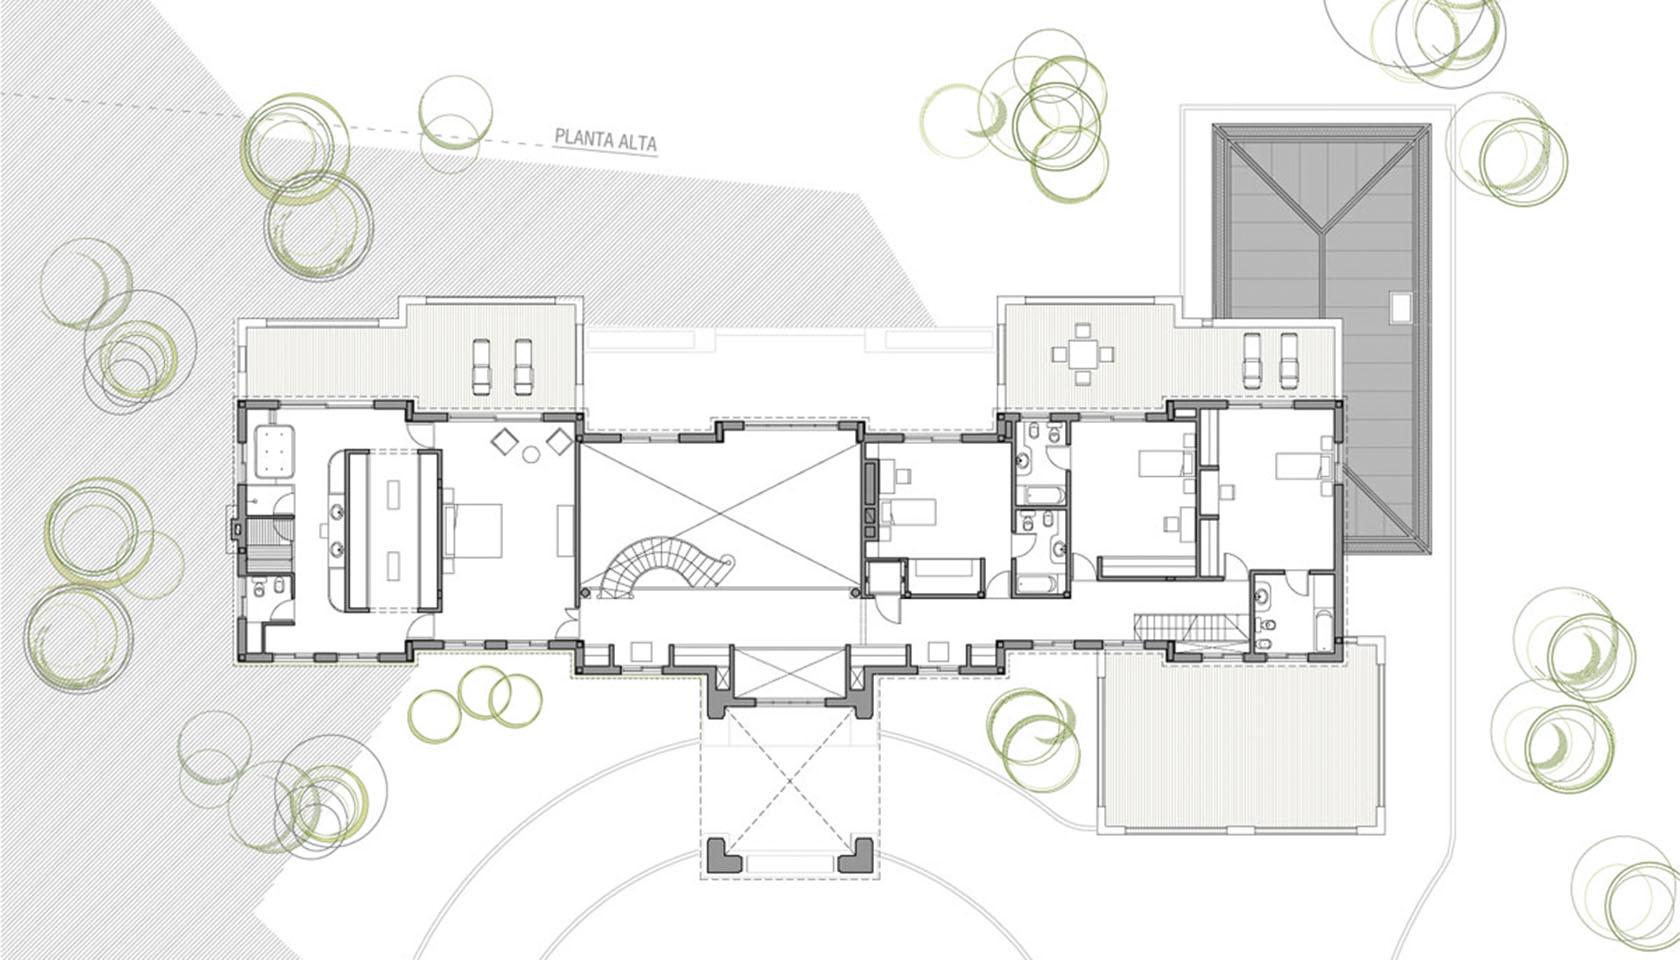 arquitectura neoclásica francesa, casas lujosas